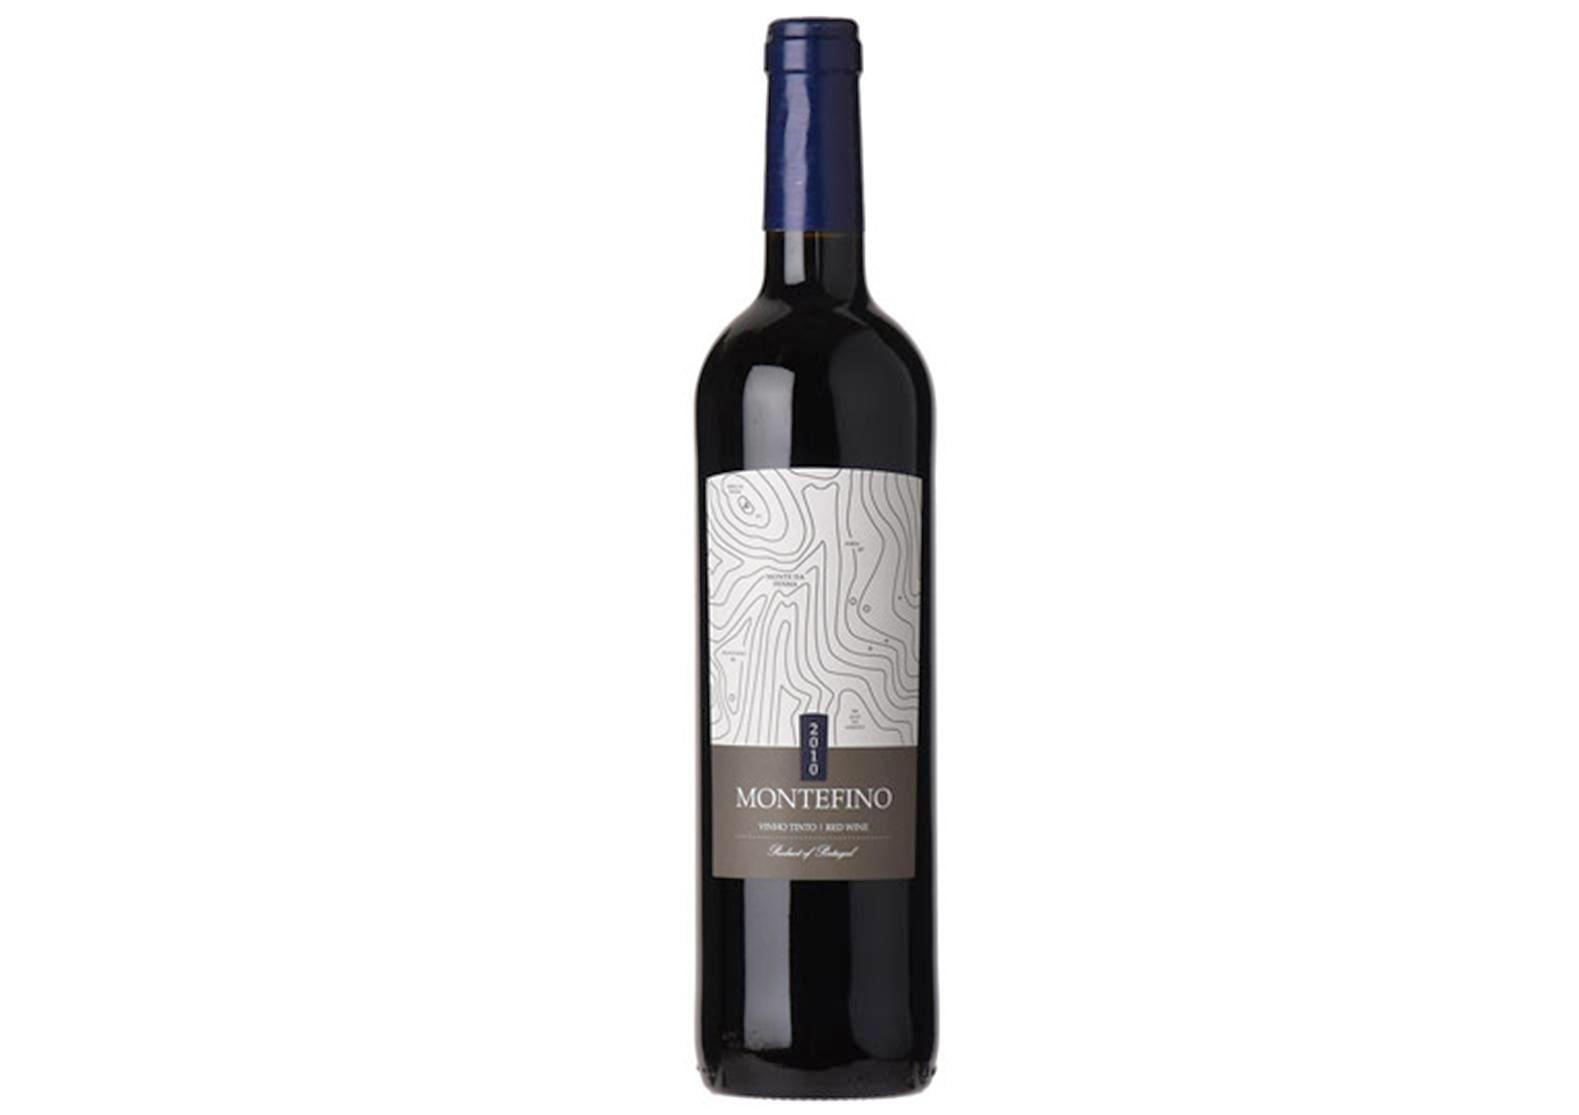 Montefino Rouge - Monte da Penha - Vins de l'Alentejo Portugal